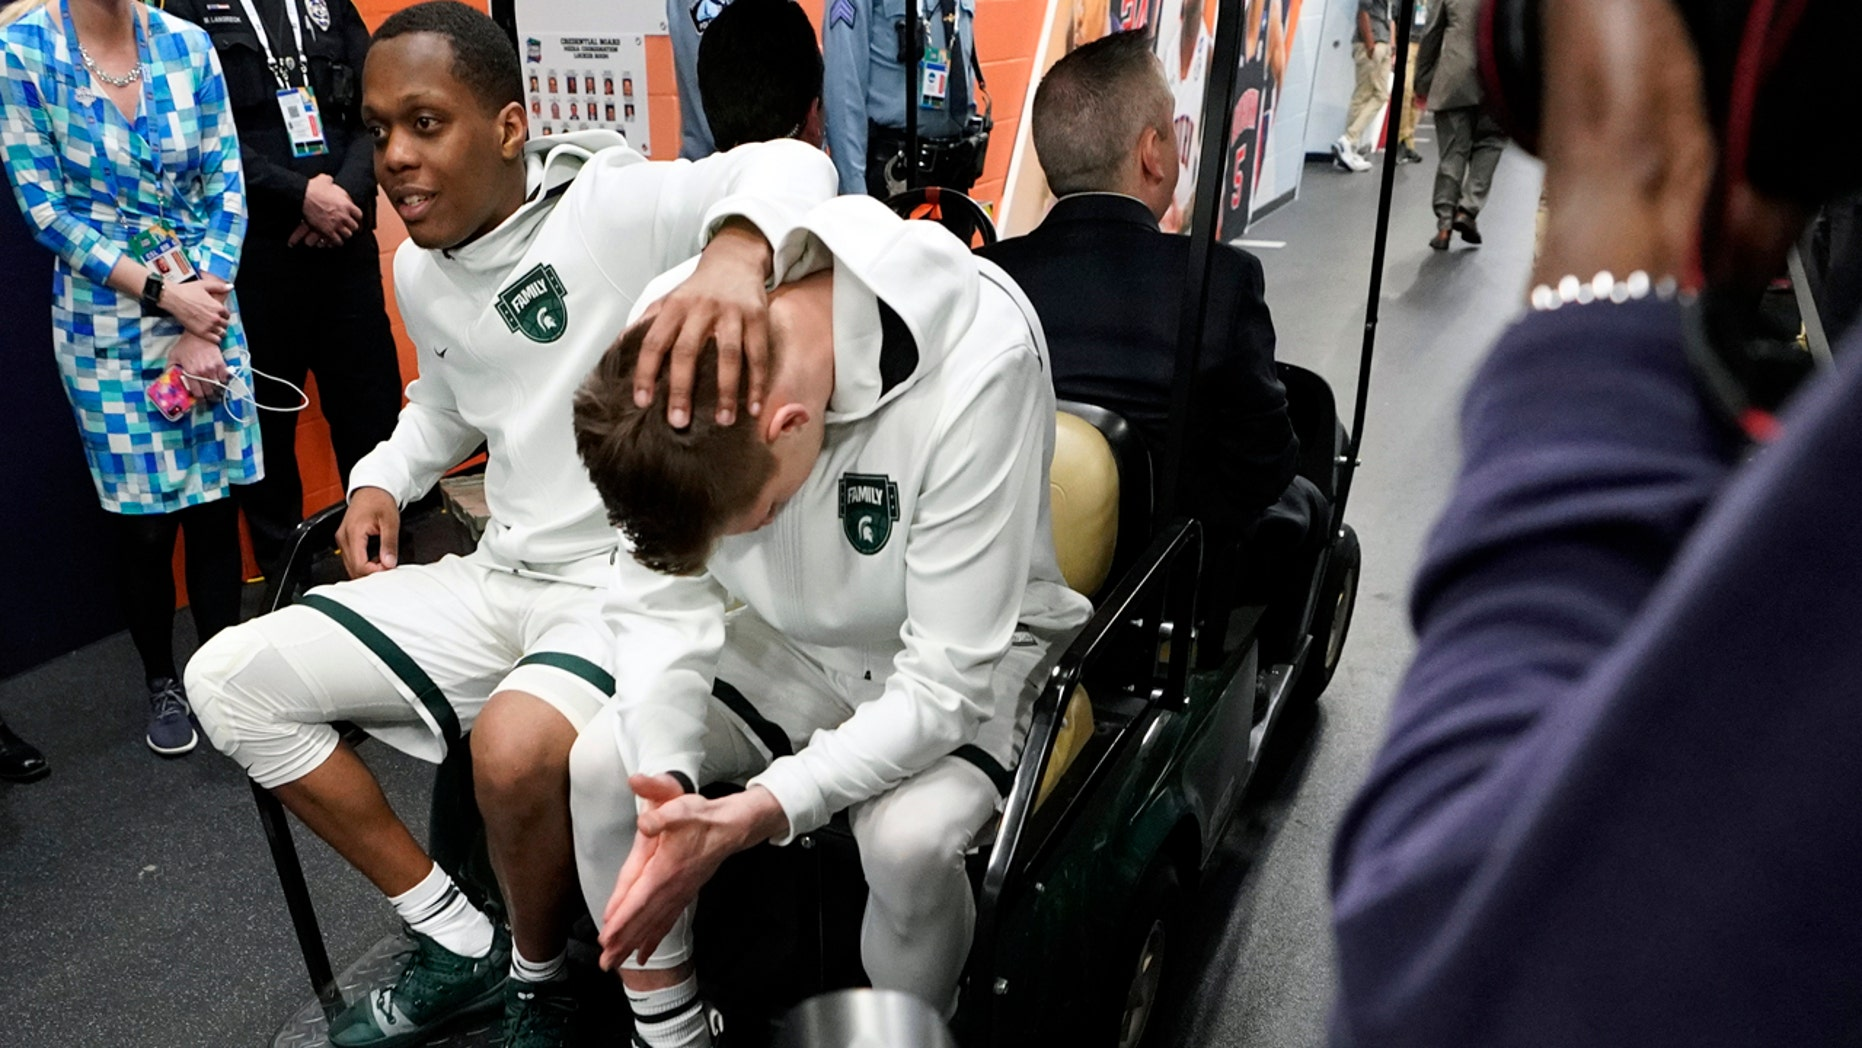 Michigan State's Cassius Winston, left, and Matt McQuaid react after the team's 61-51 loss to Texas Tech. (AP Photo/David J. Phillip)